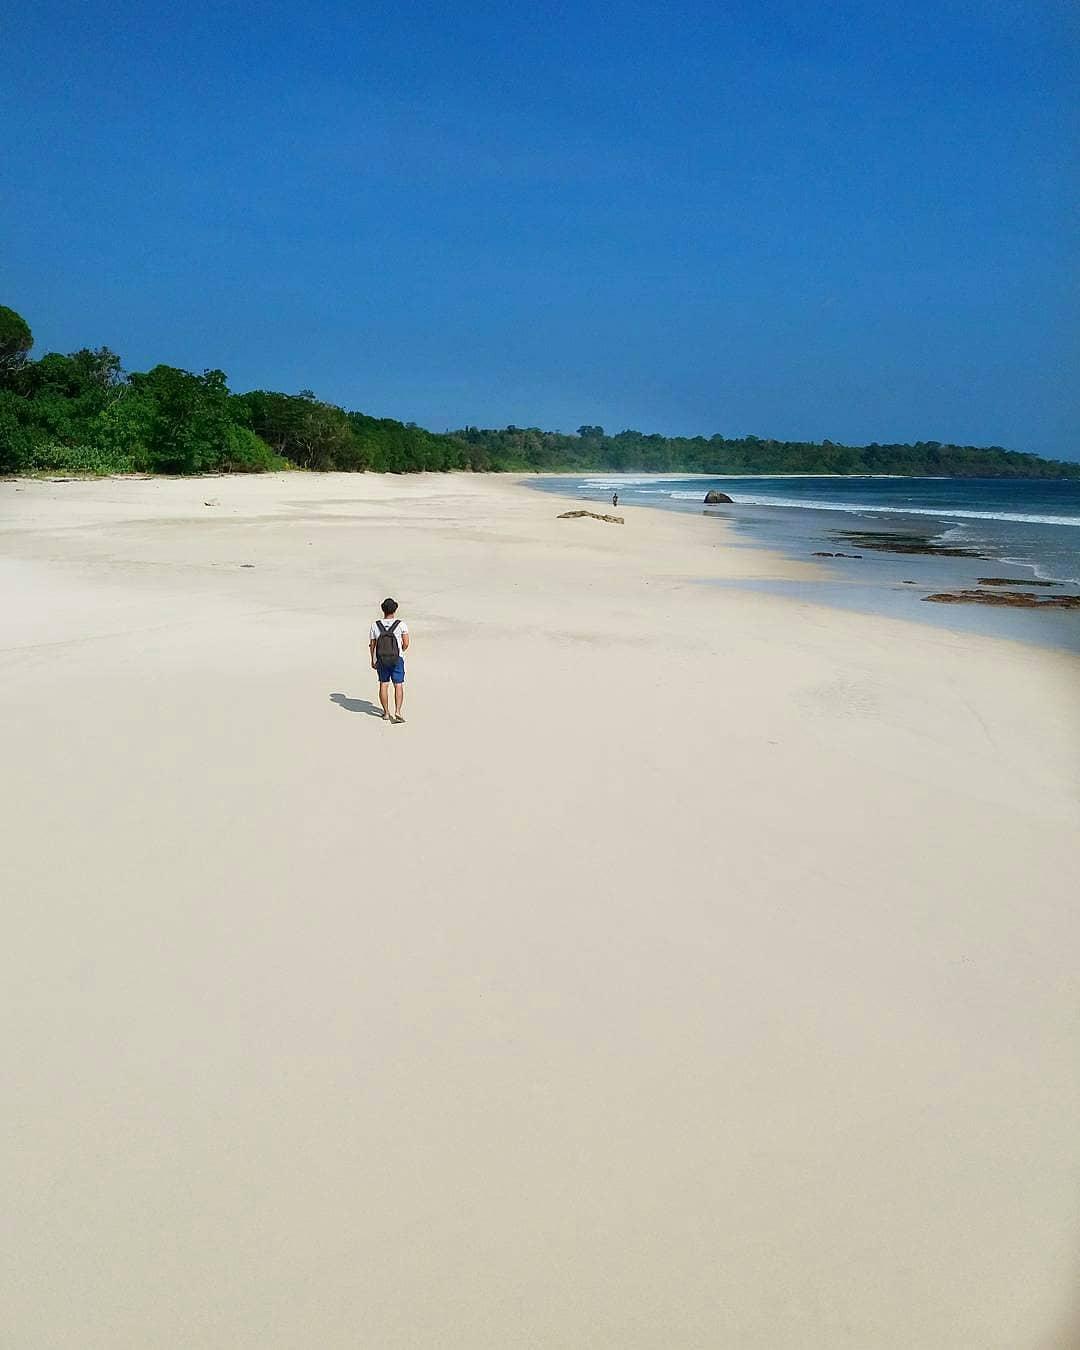 Pantai Ombak Tujuh